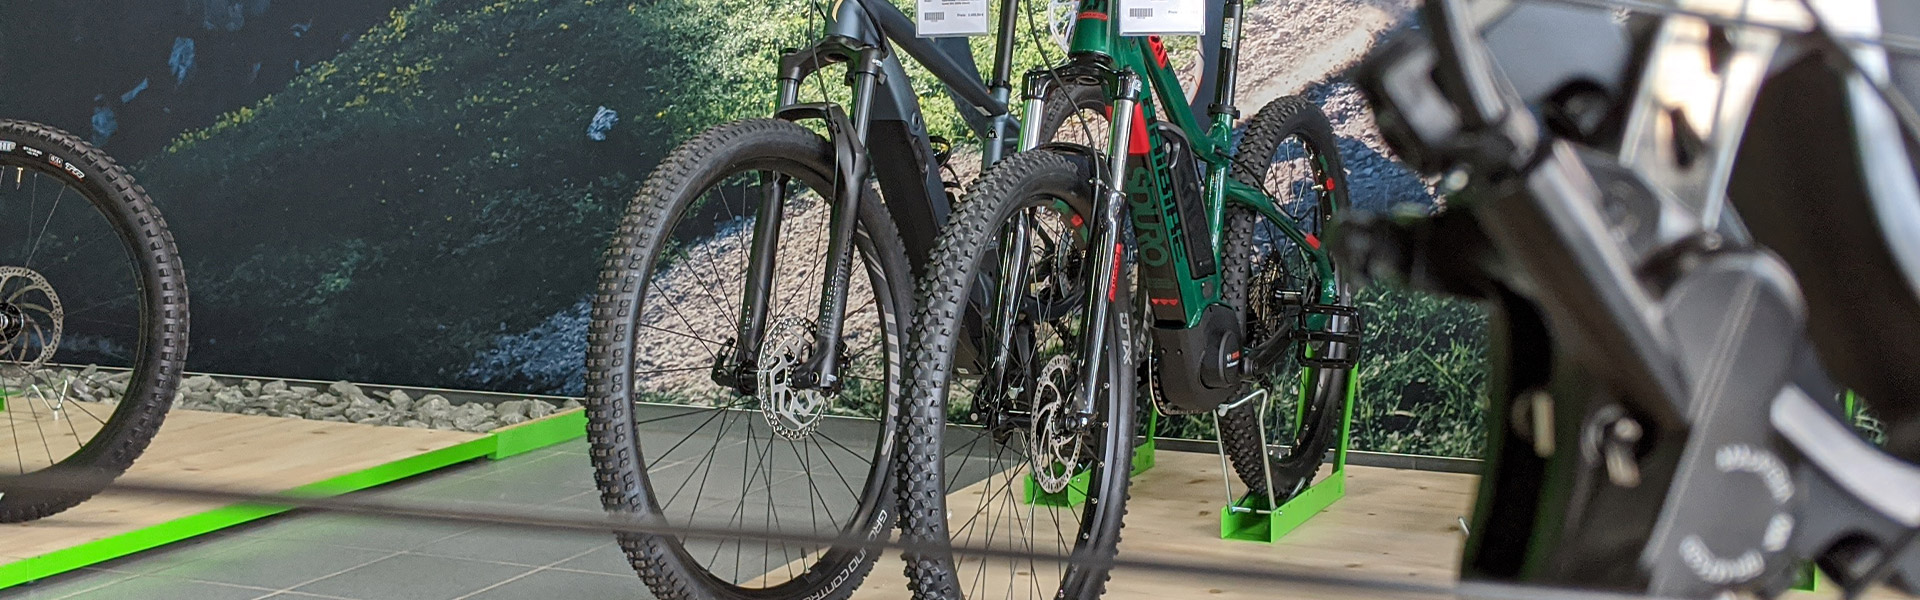 Der Shop der e-motion e-Bike Welt Westhausen